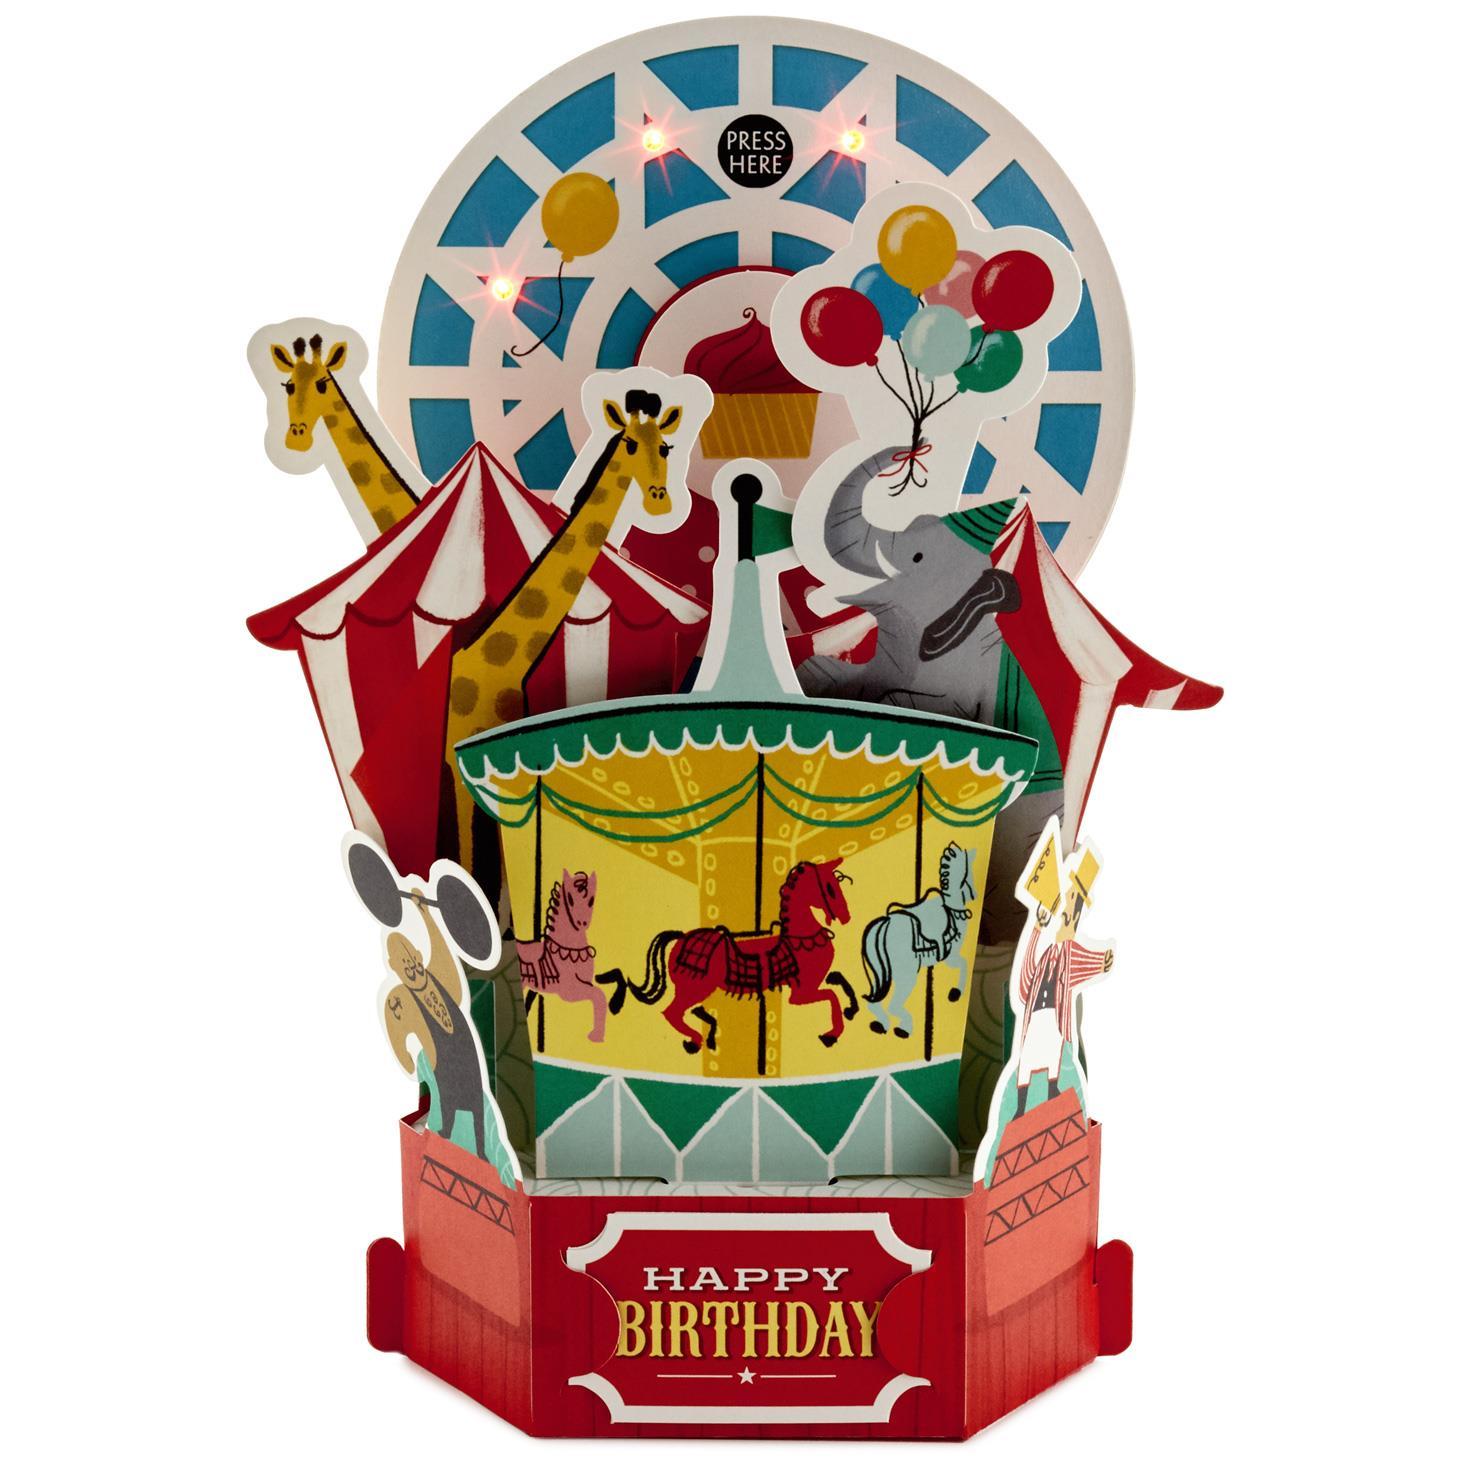 Circus Fun Pop Up Musical Birthday Card With Light